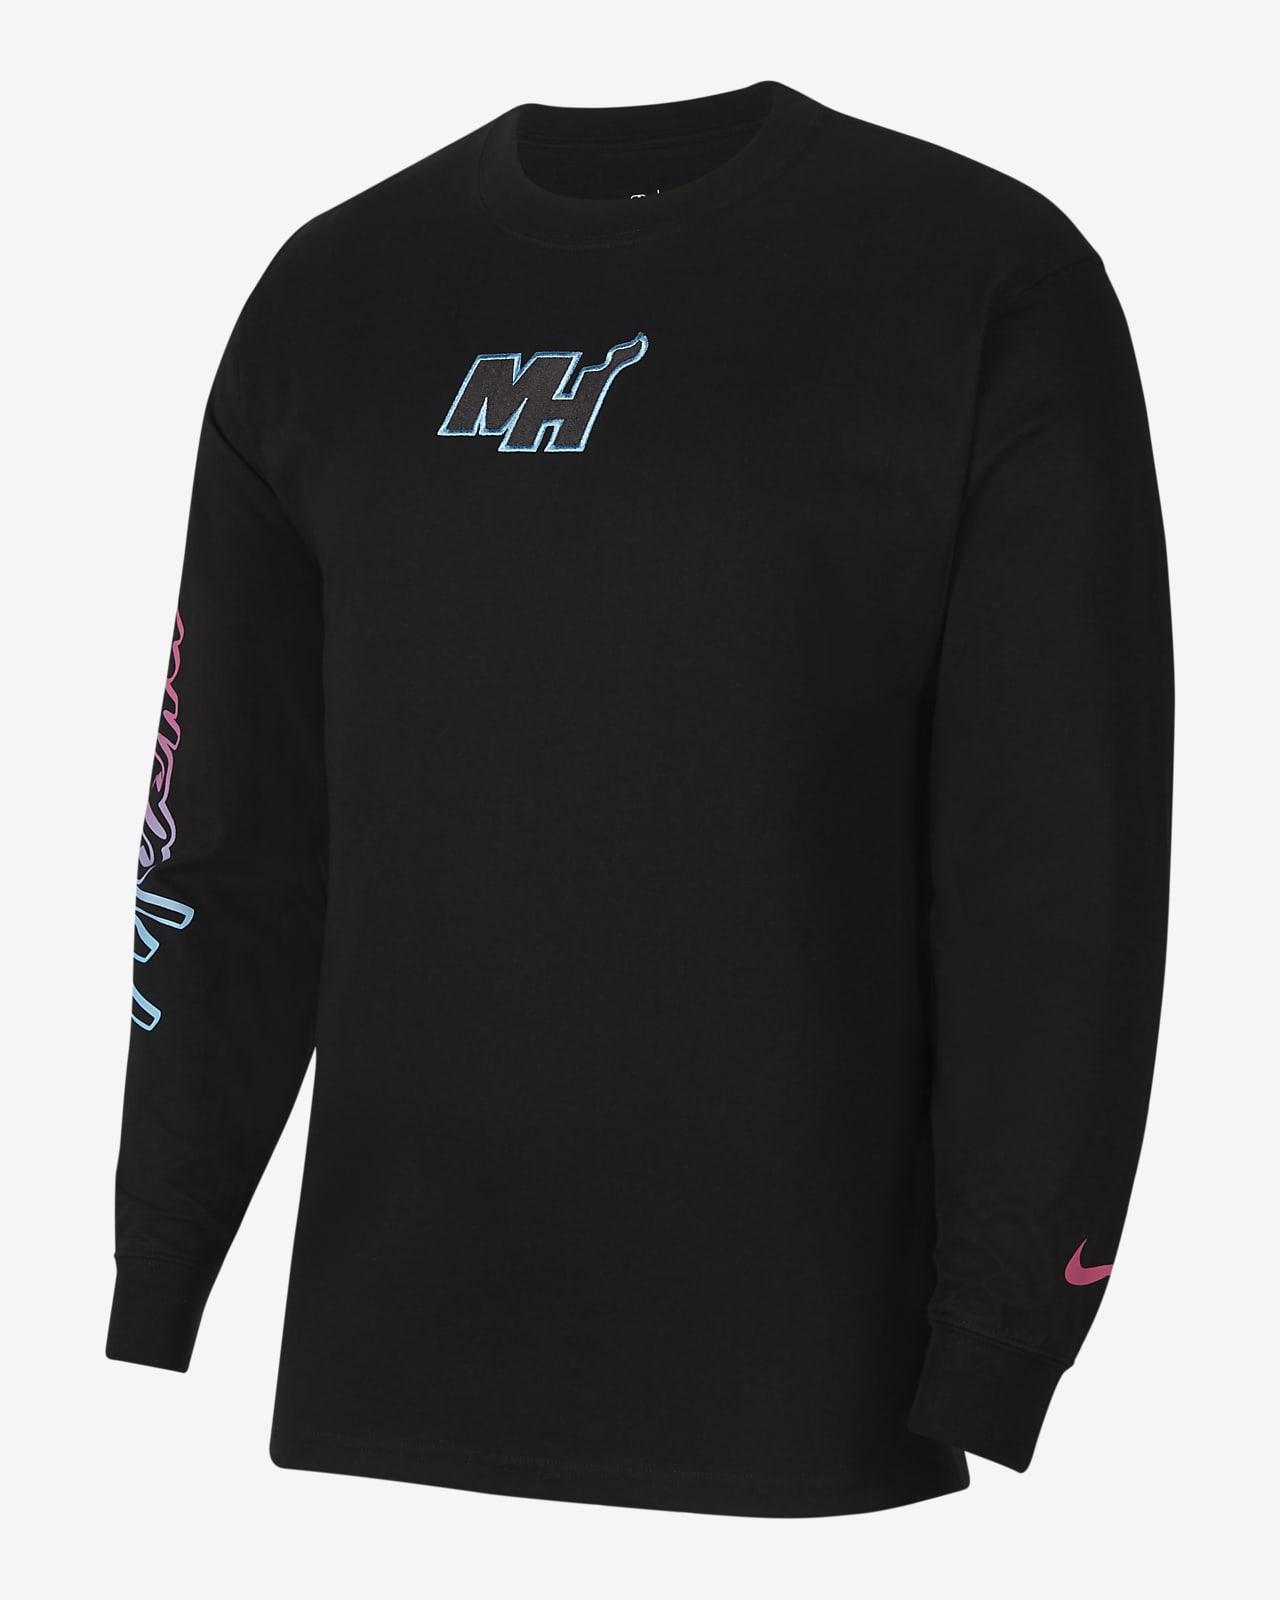 profundizar Estúpido Encommium  Miami Heat Courtside City Edition Men's Nike NBA T-Shirt. Nike IL